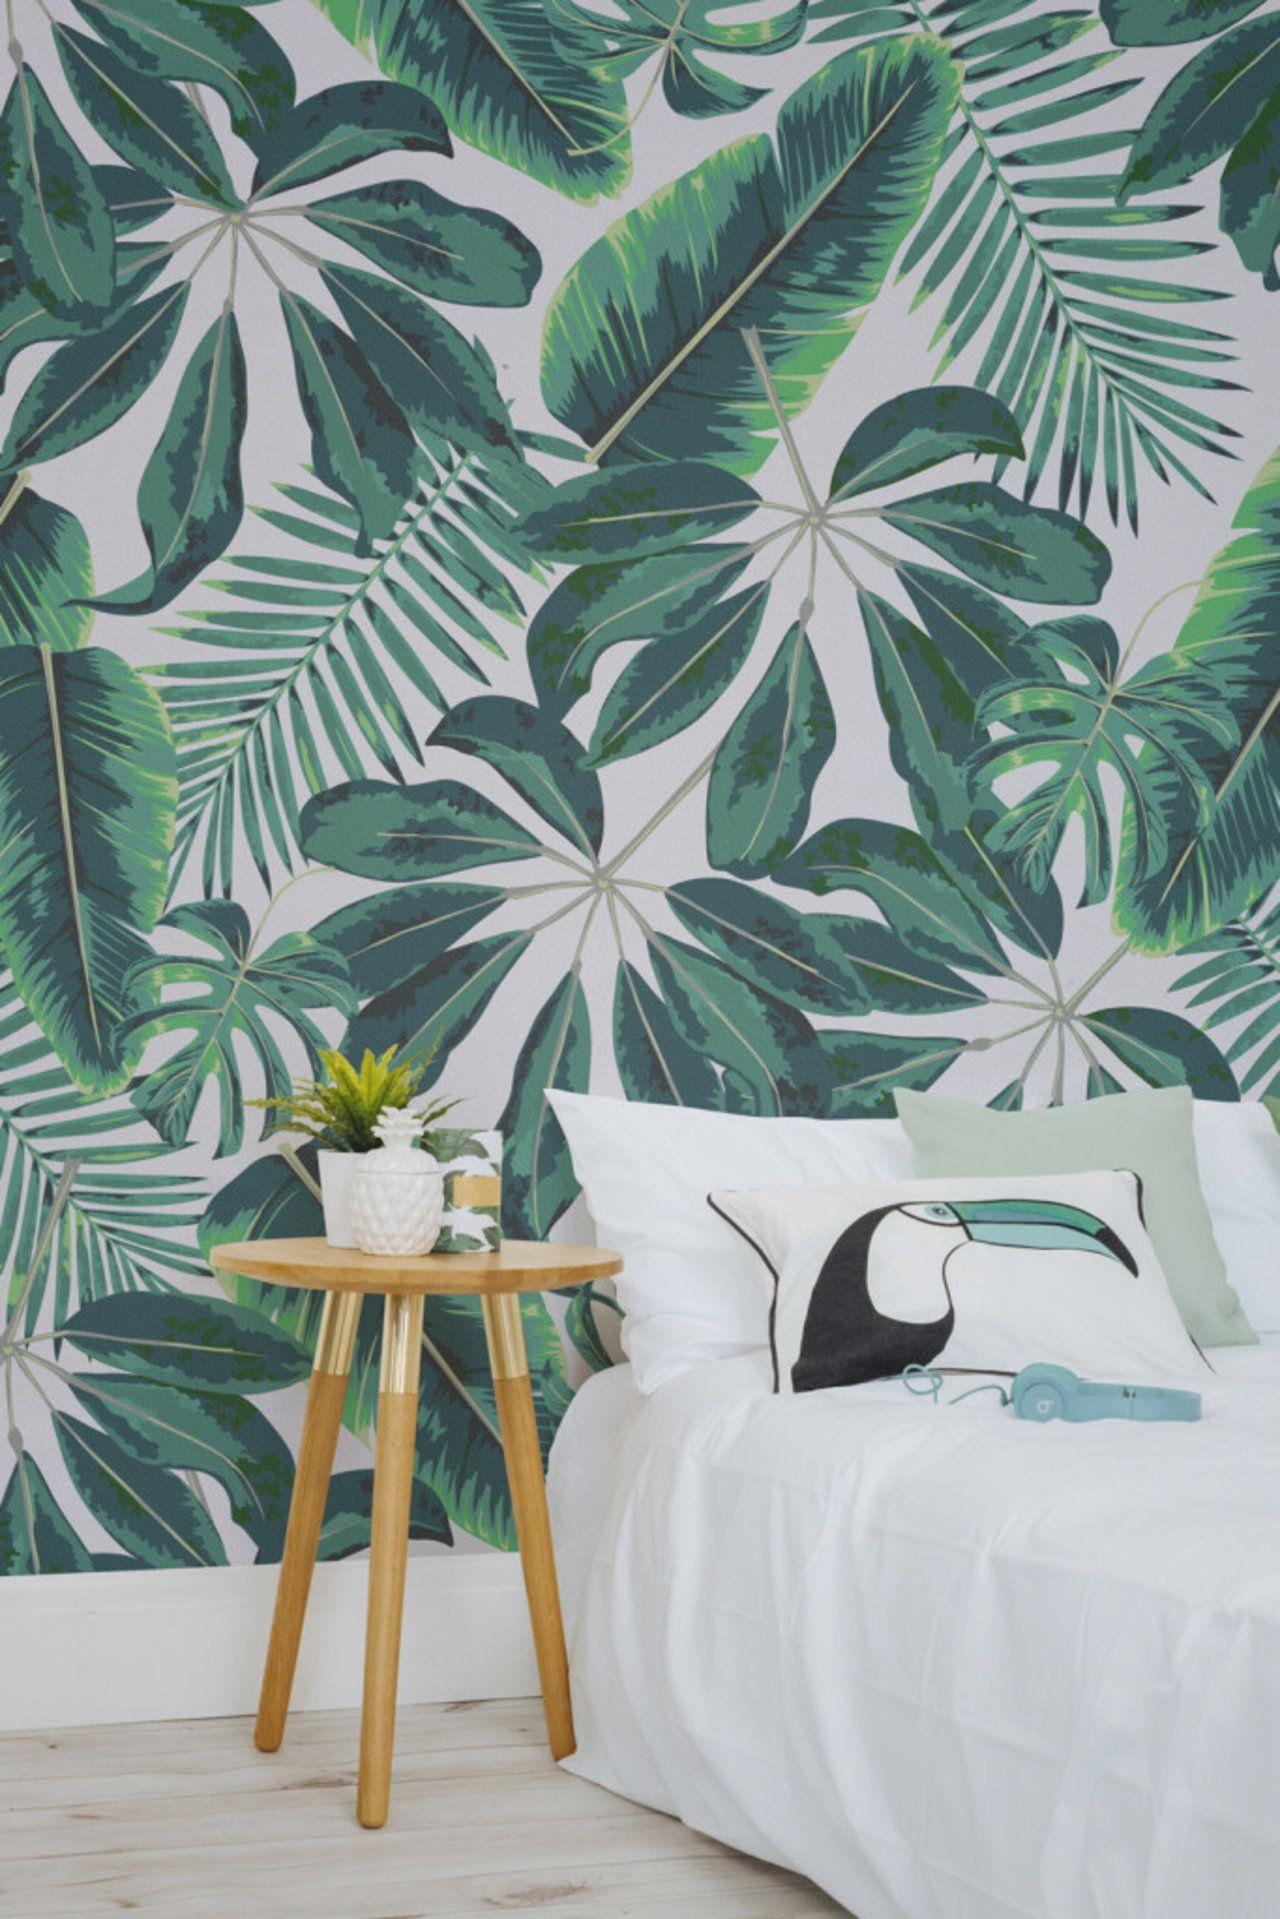 Home Nousdecor Tropical Home Decor Tropical Bedrooms Wallpaper Bedroom